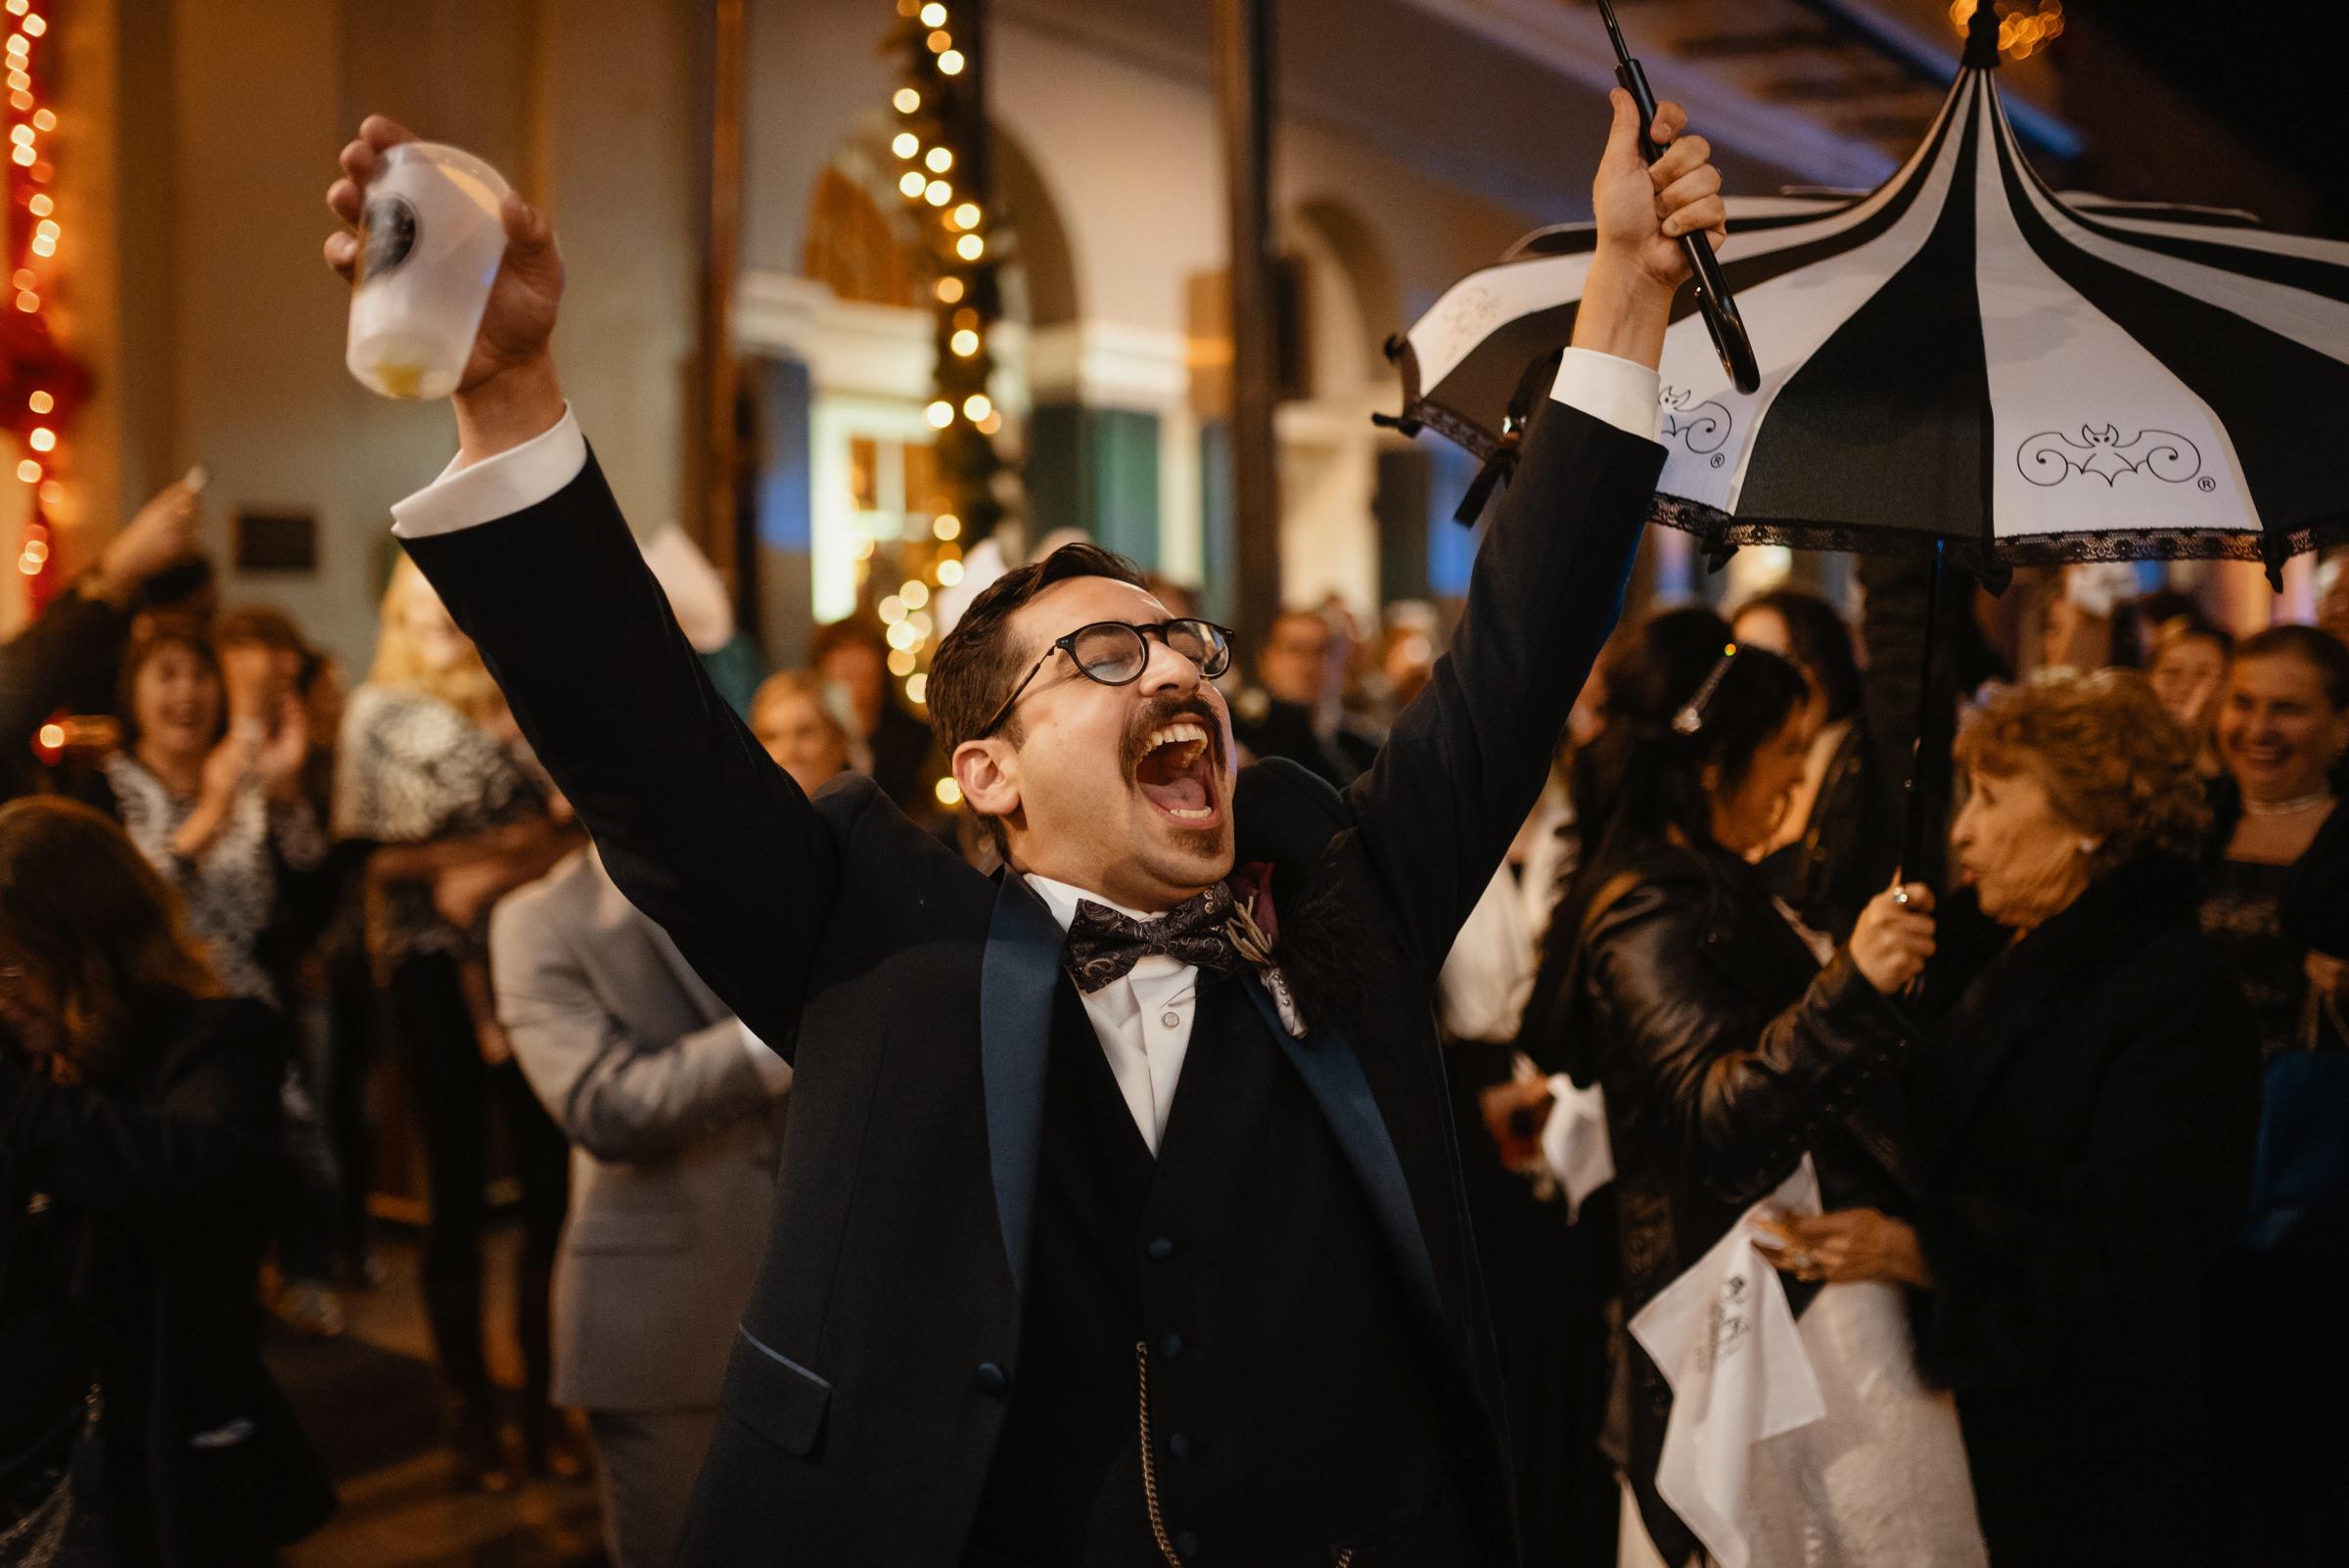 Groom raises glass in celebration at Austing wedding, photo by Dark Roux